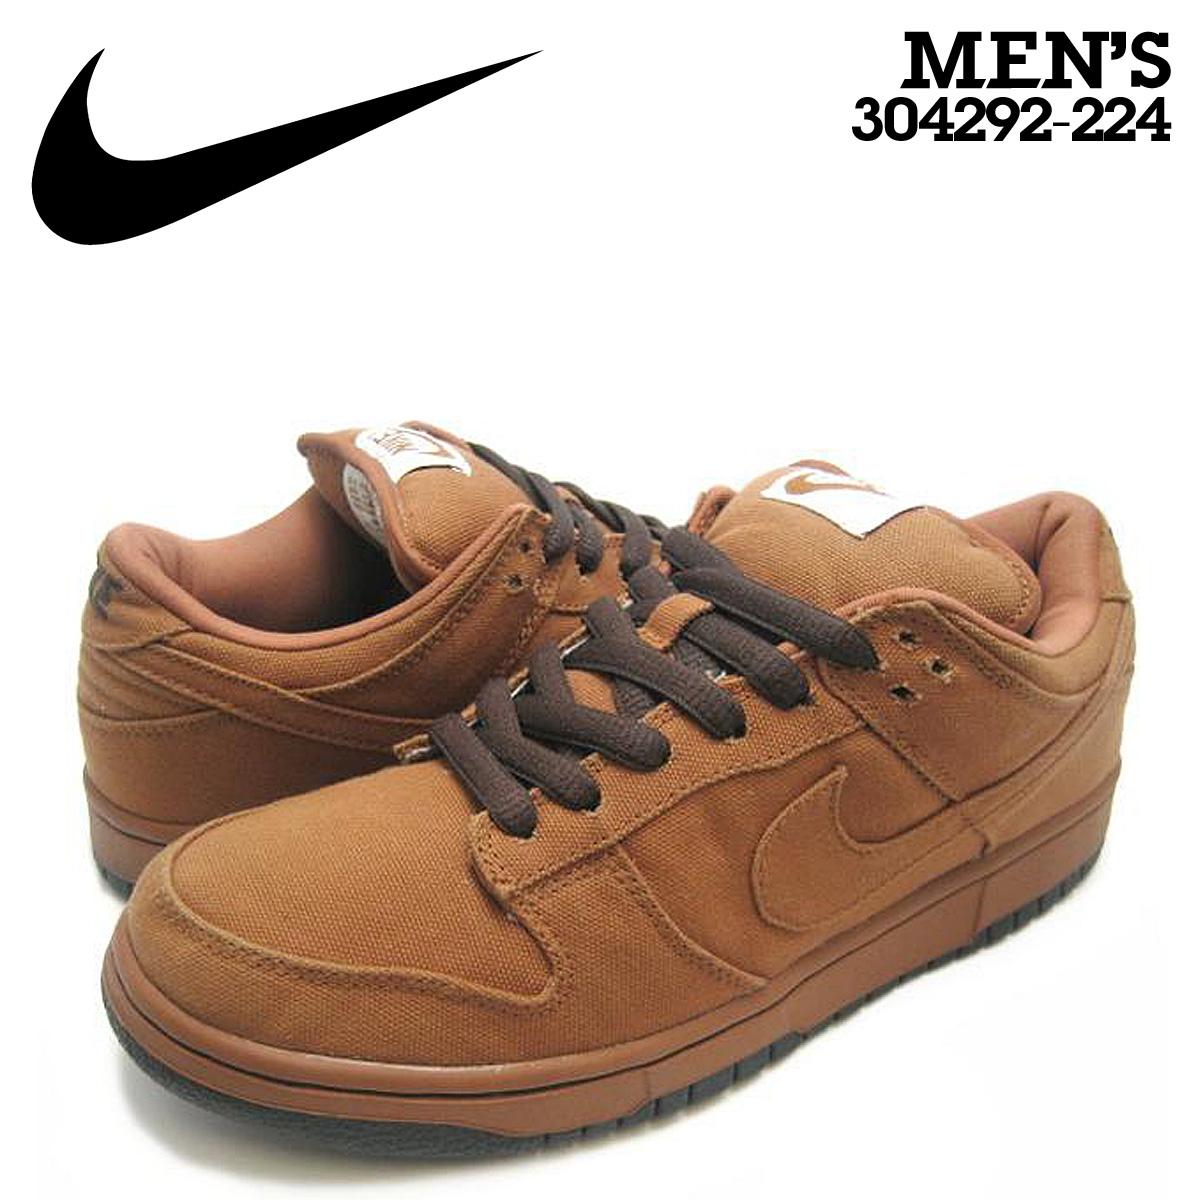 Nike NIKE dunk sneakers DUNK LOW PRO SB CARHARTT dunk low pro S beaker  heart 304 dae8948473b9